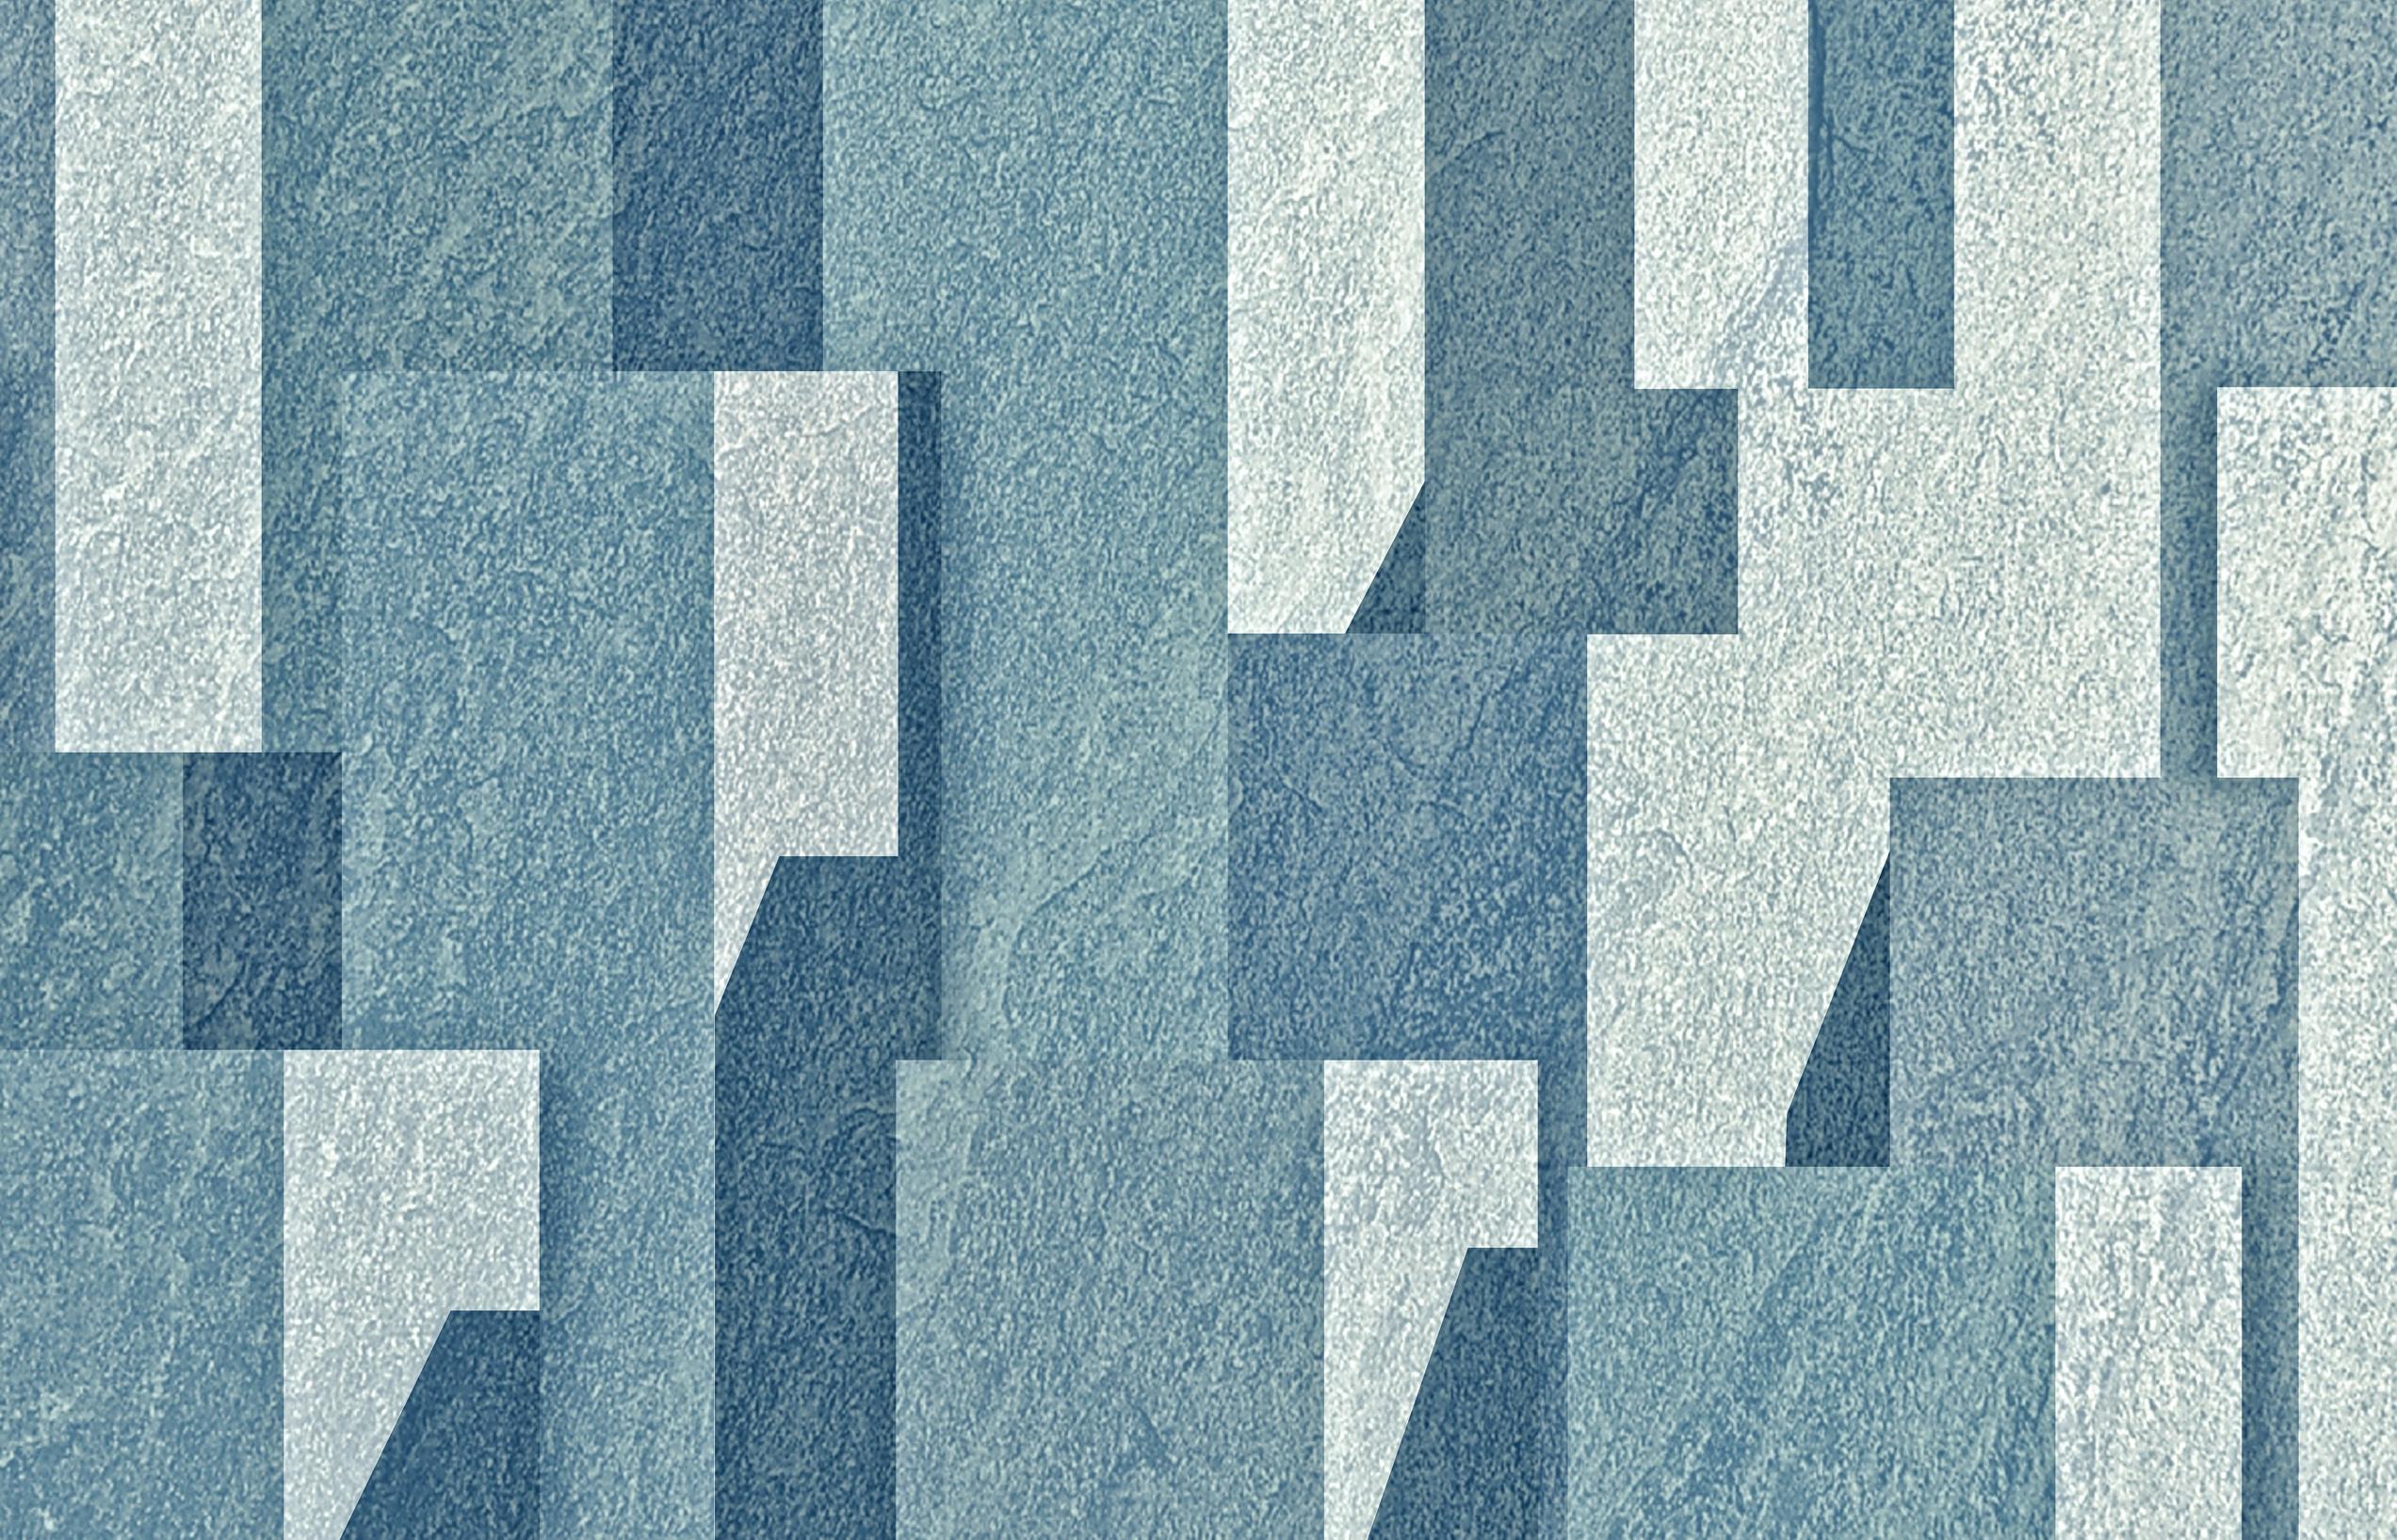 Concrete Blocks Background, 3d, Nature, Retro, Render, HQ Photo